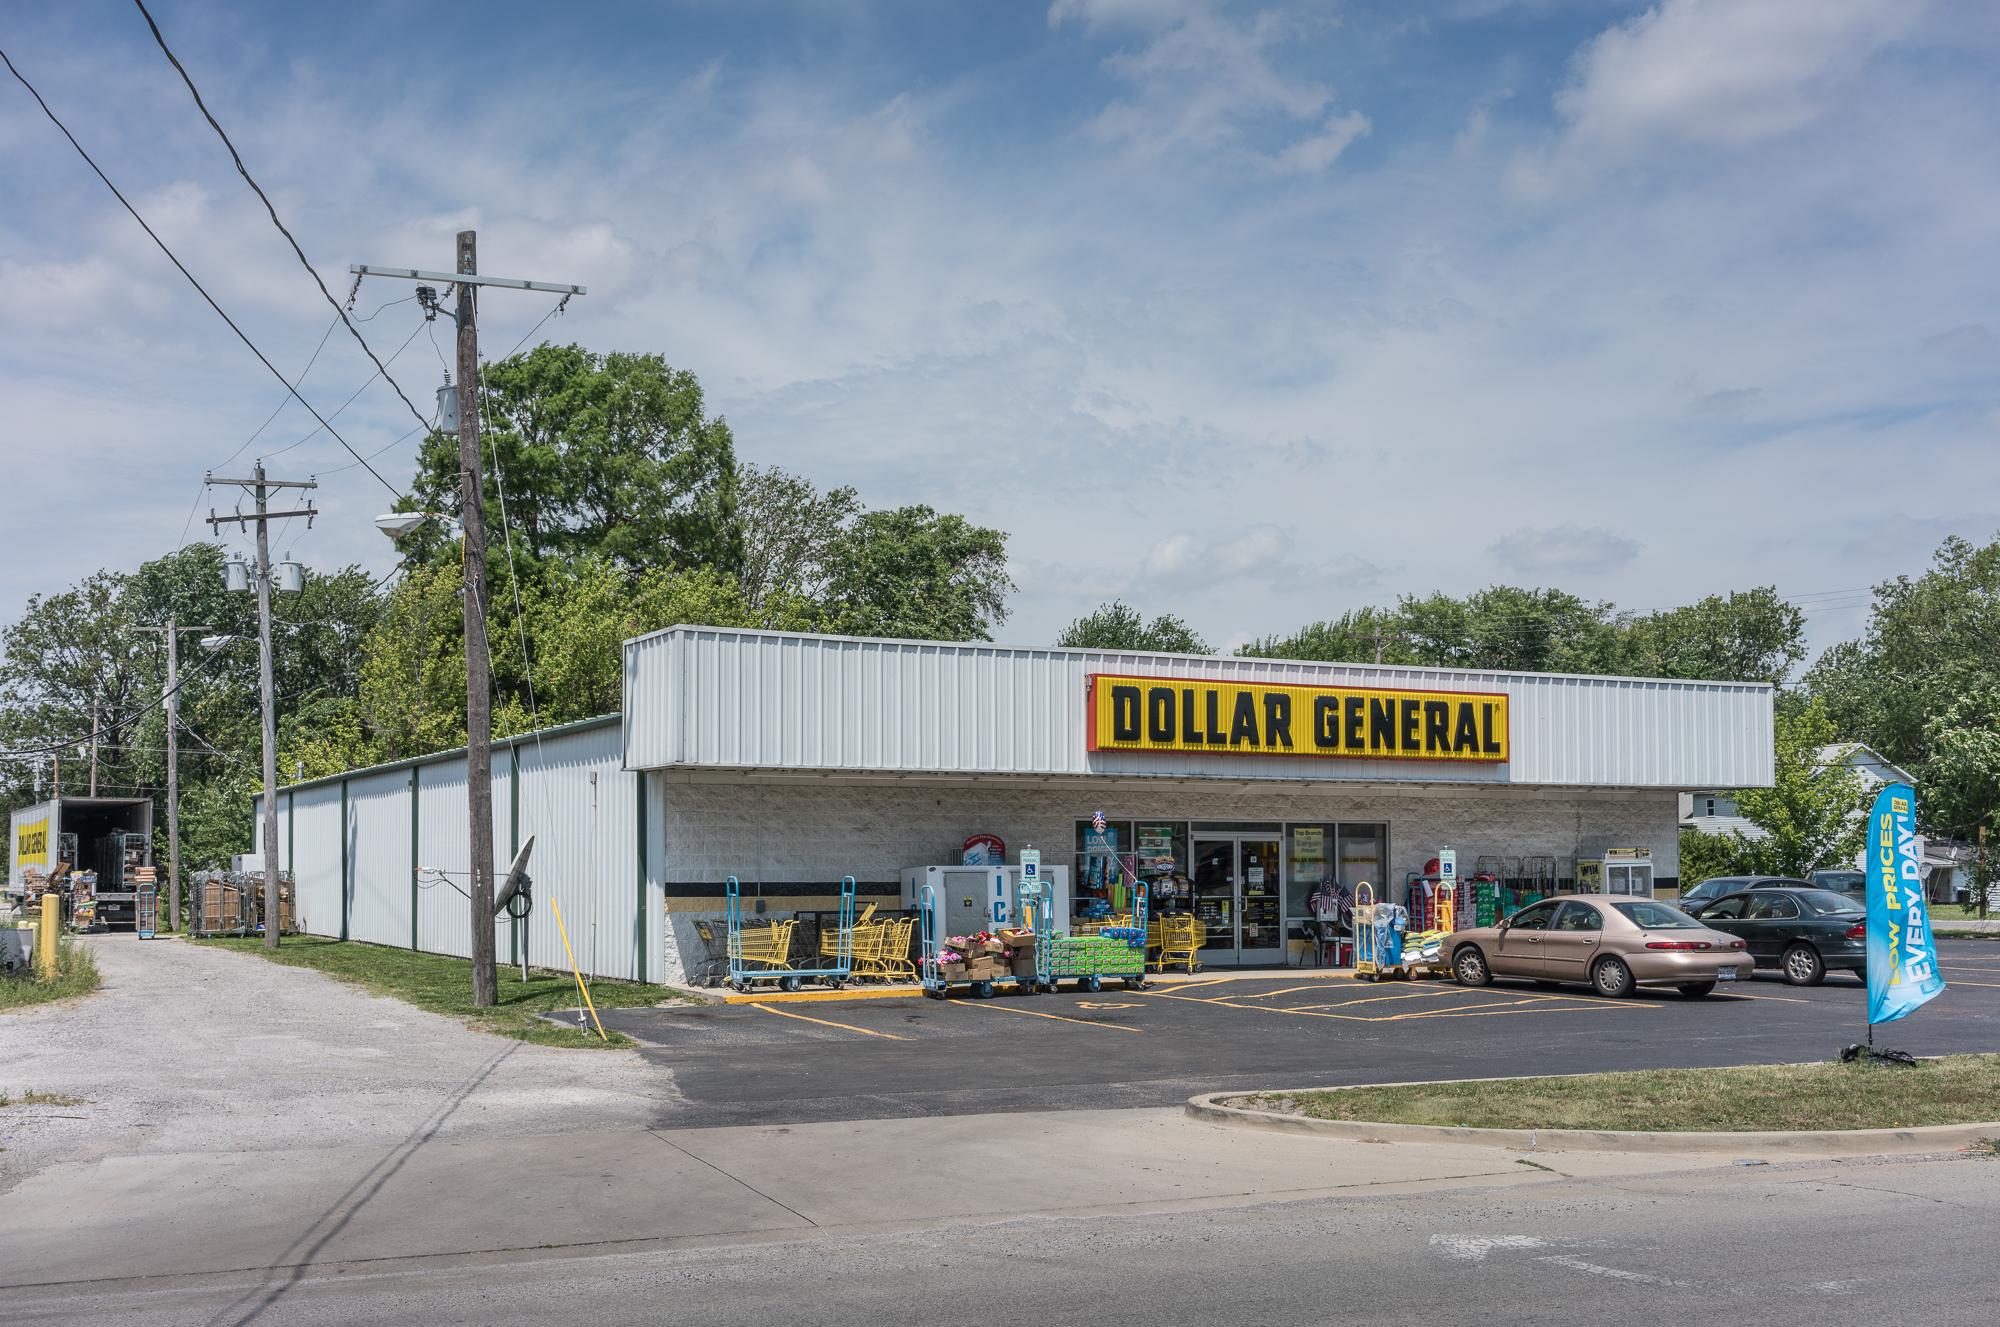 Dollar General, Sandoval, Illinois, 2017